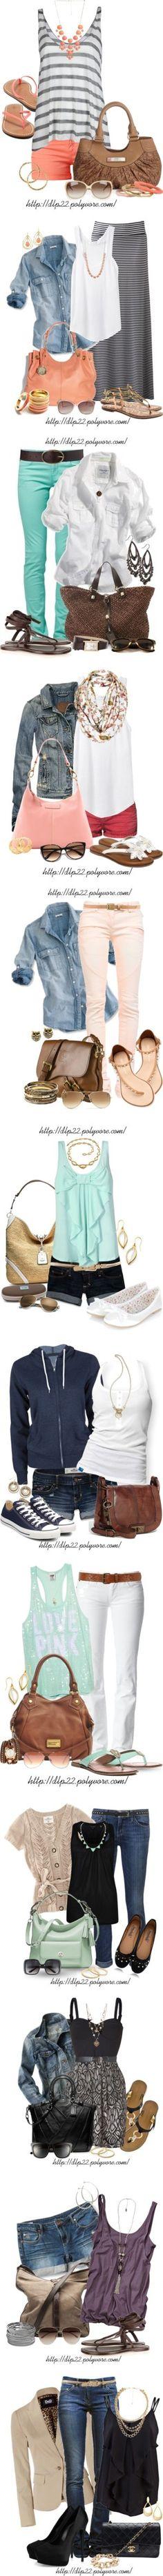 summer styles, fashion, summer vacations, cloth, dress, spring summer, summer outfits, closet, wear